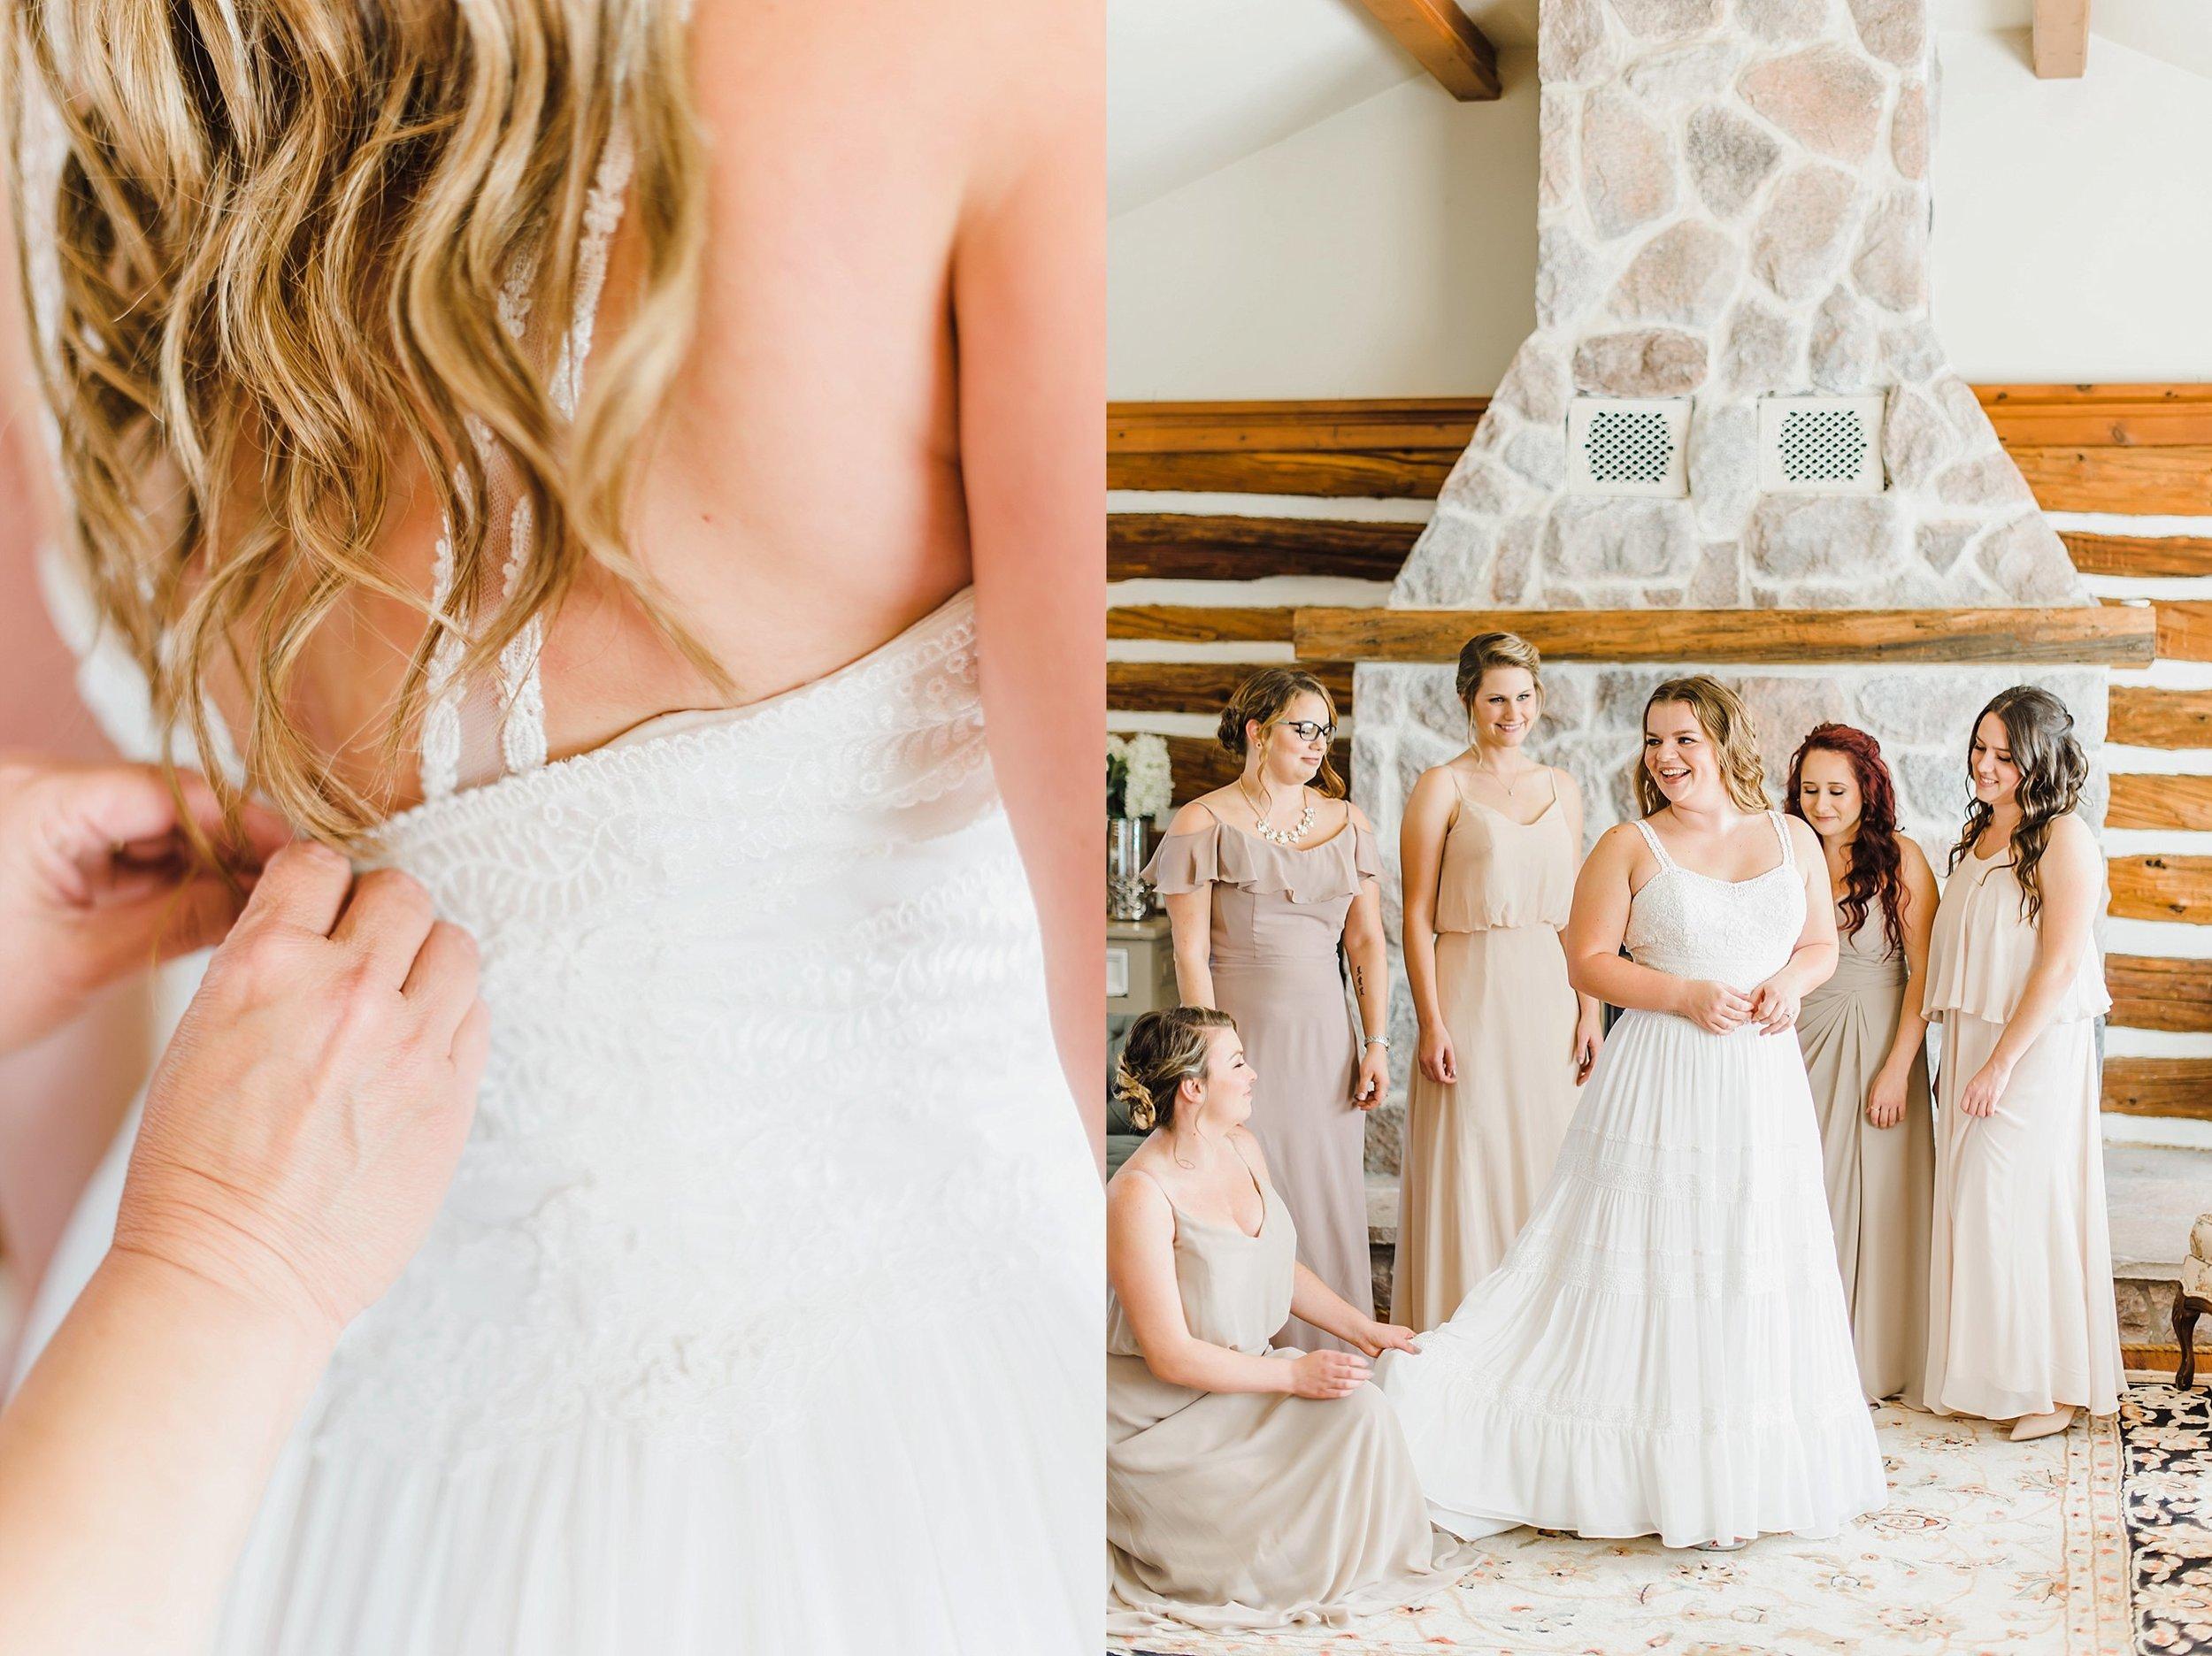 light airy indie fine art ottawa wedding photographer | Ali and Batoul Photography_1064.jpg